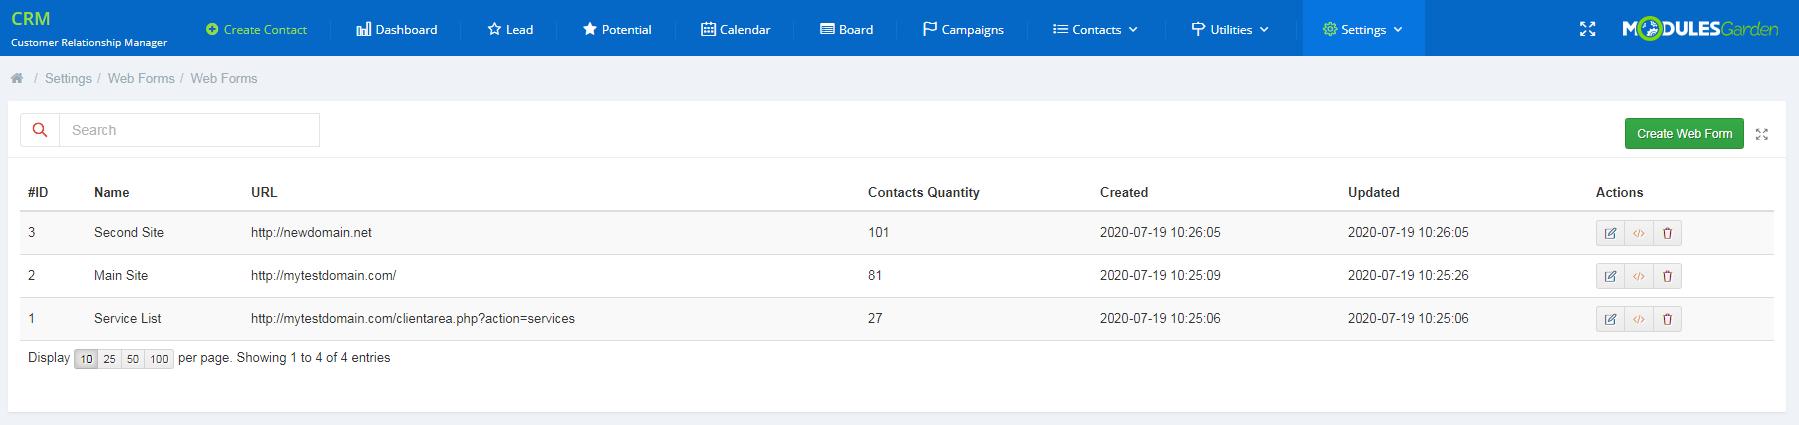 CRM For WHMCS: Module Screenshot 27